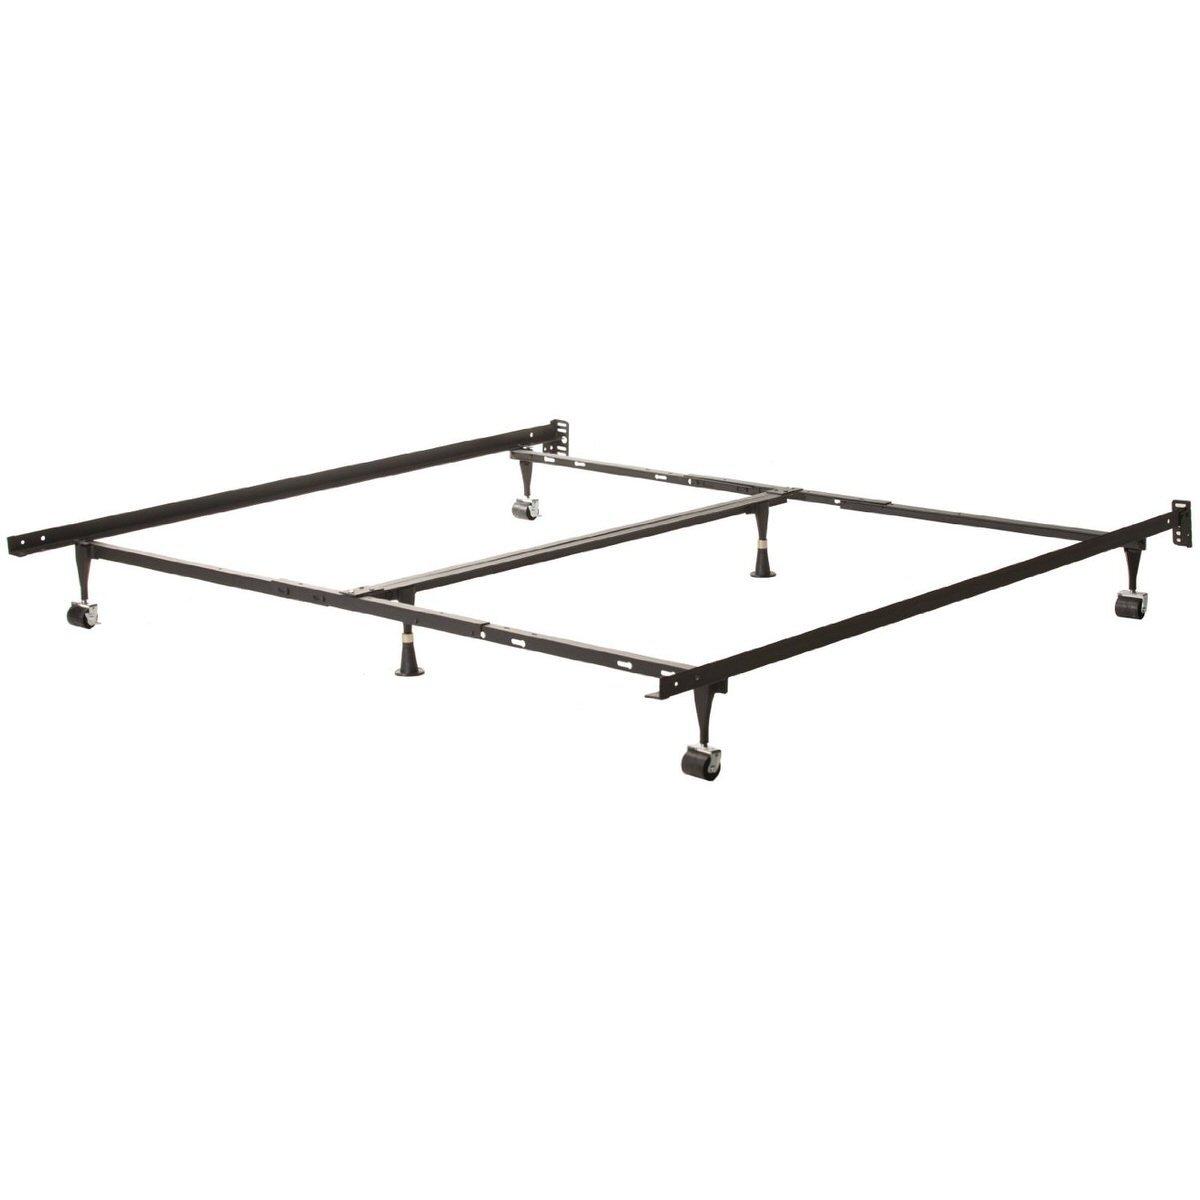 Universal Adjustable Metal Bed Frame Queen/King